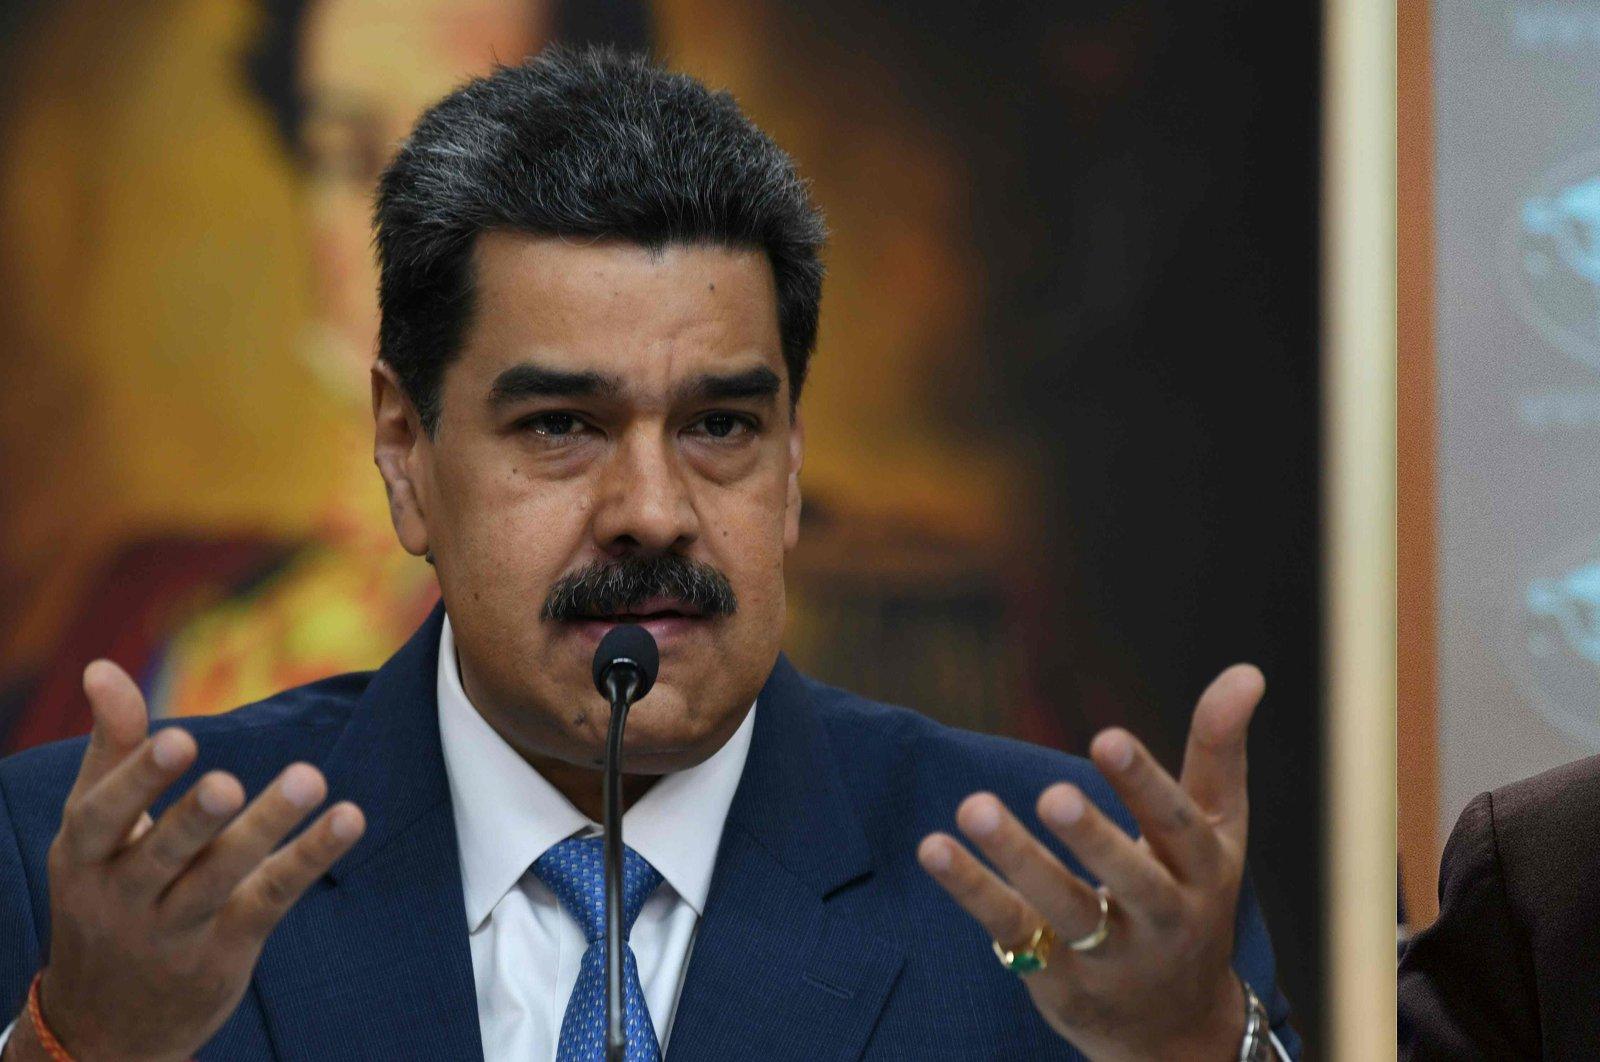 Venezuelan President Nicolas Maduro (L) on Feb. 14, 2020, in Caracas, Venezuela, and U.S. Secretary of State Mike Pompeo on March 17, 2020, in Washington, D.C. (AFP Photo)